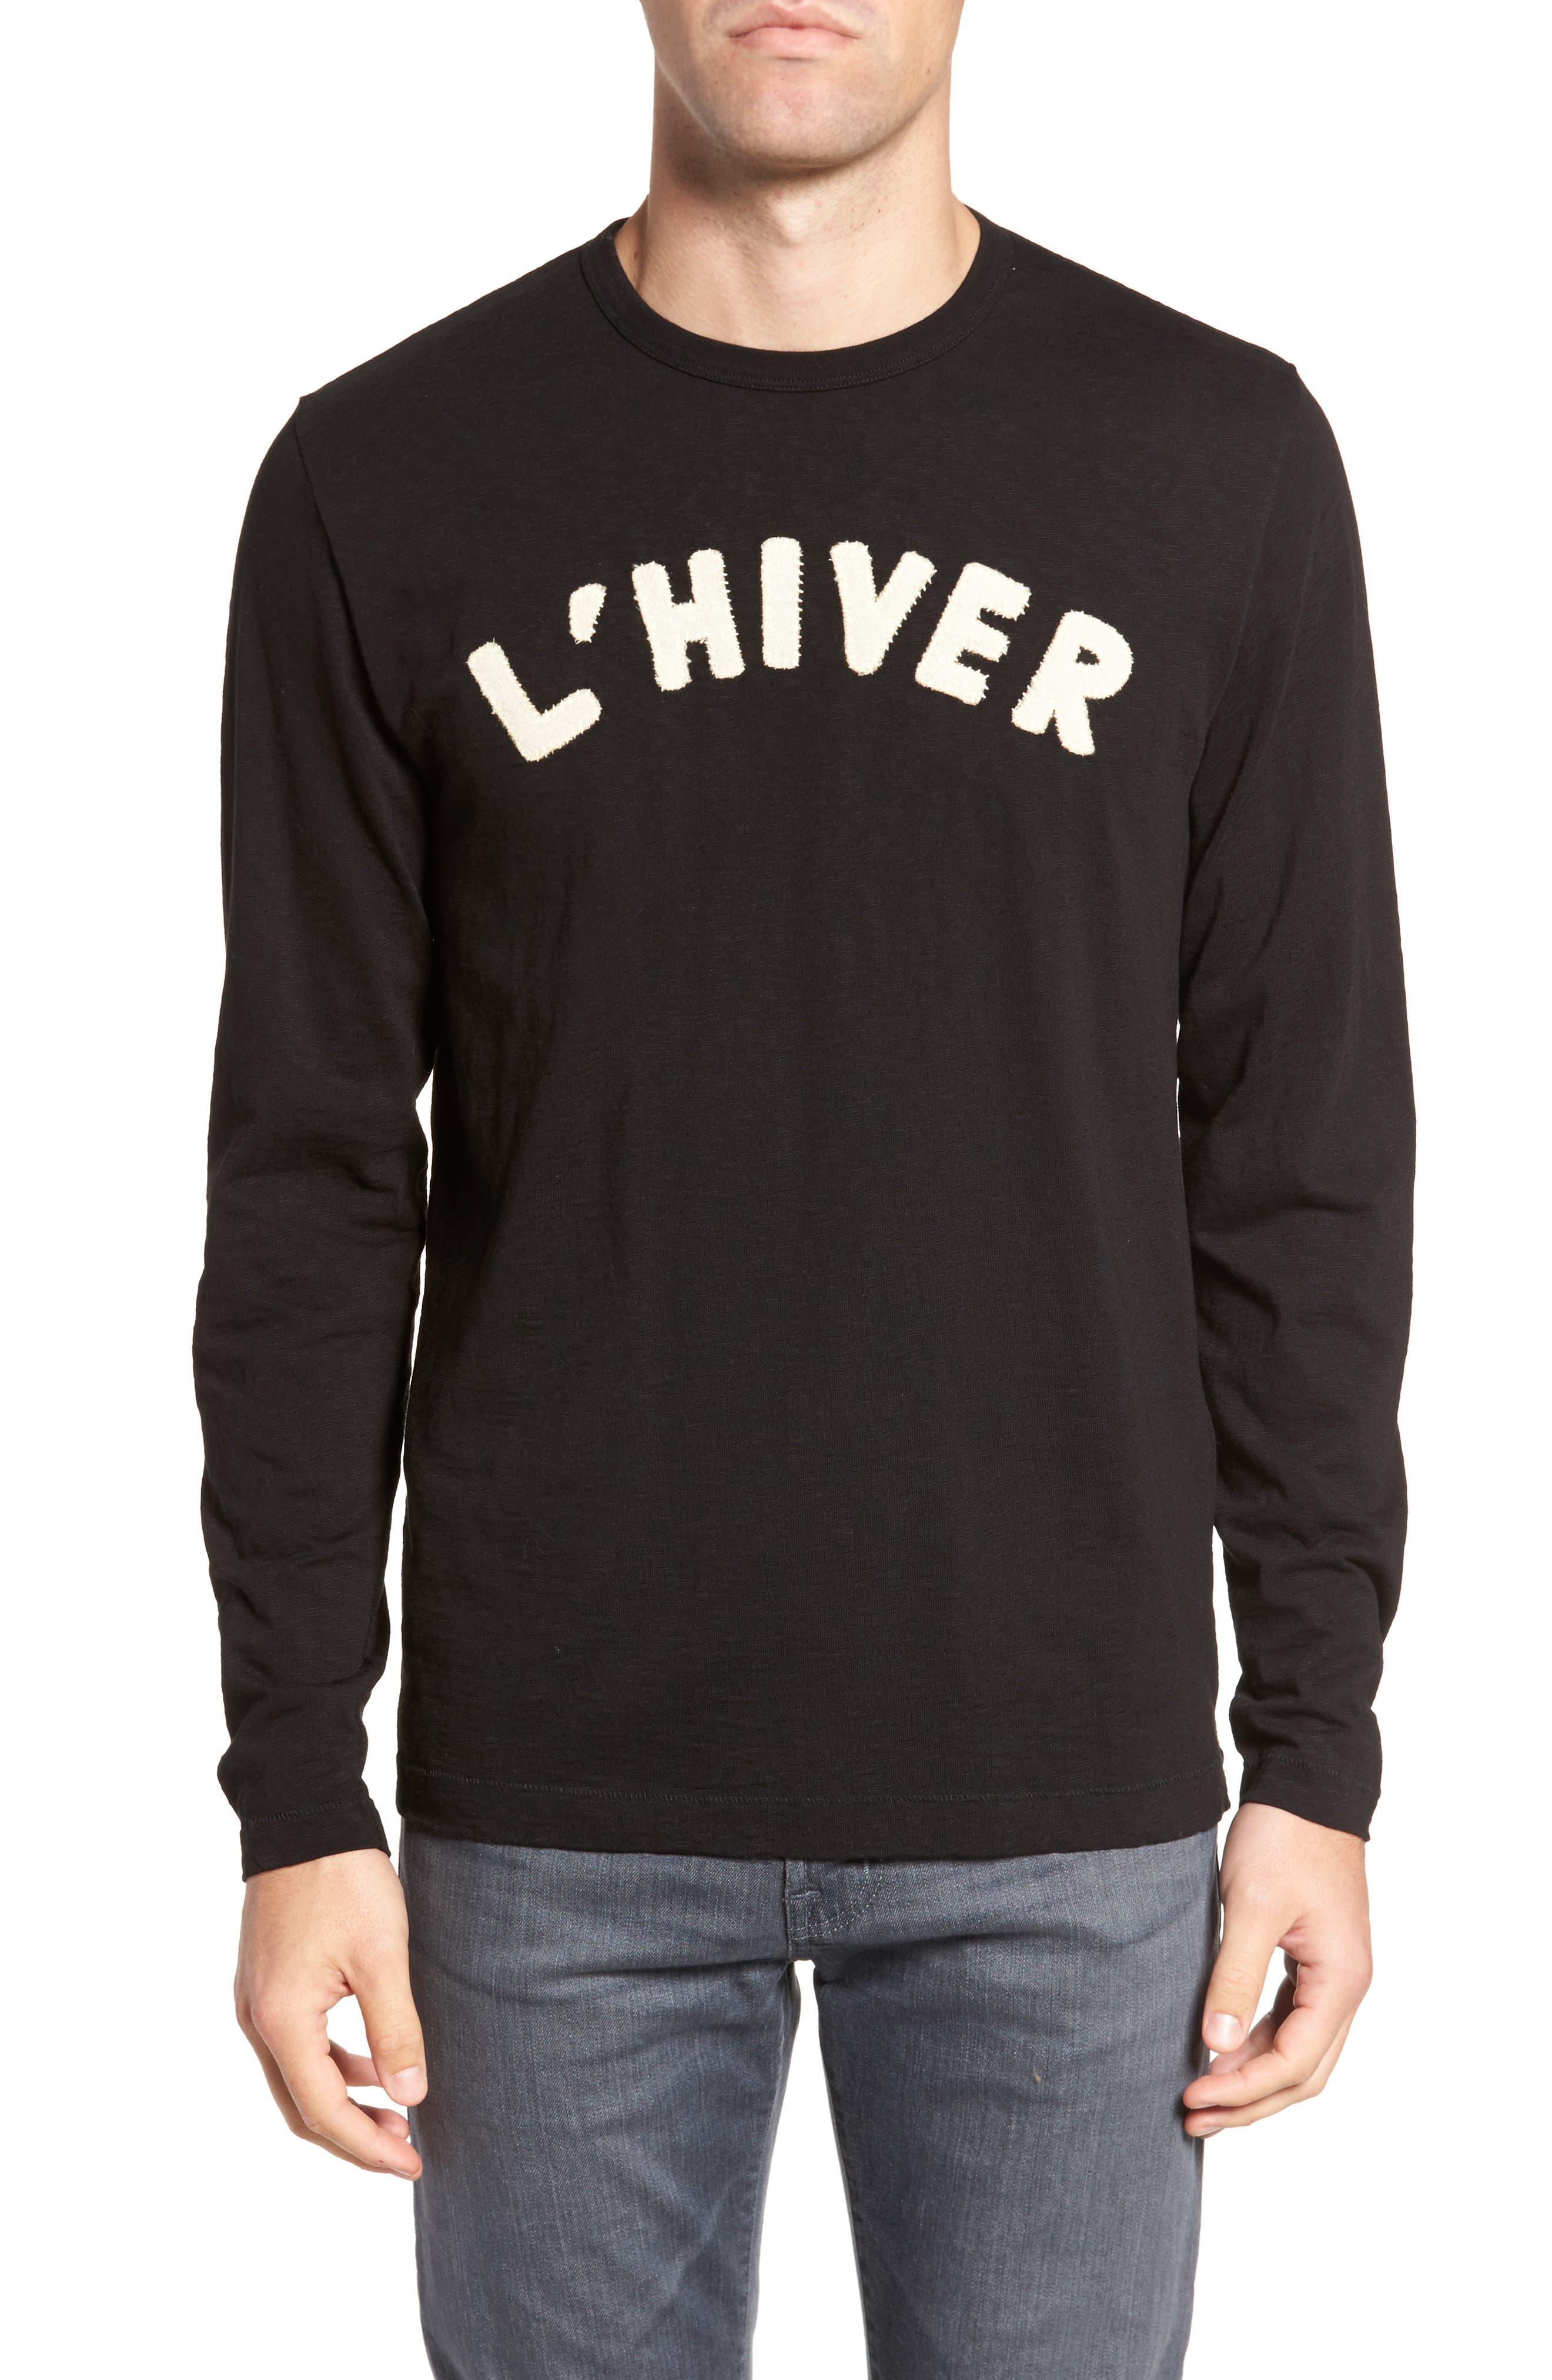 L'Hiver Regular Fit Long Sleeve T-shirt,                             Main thumbnail 1, color,                             Black/ Clay